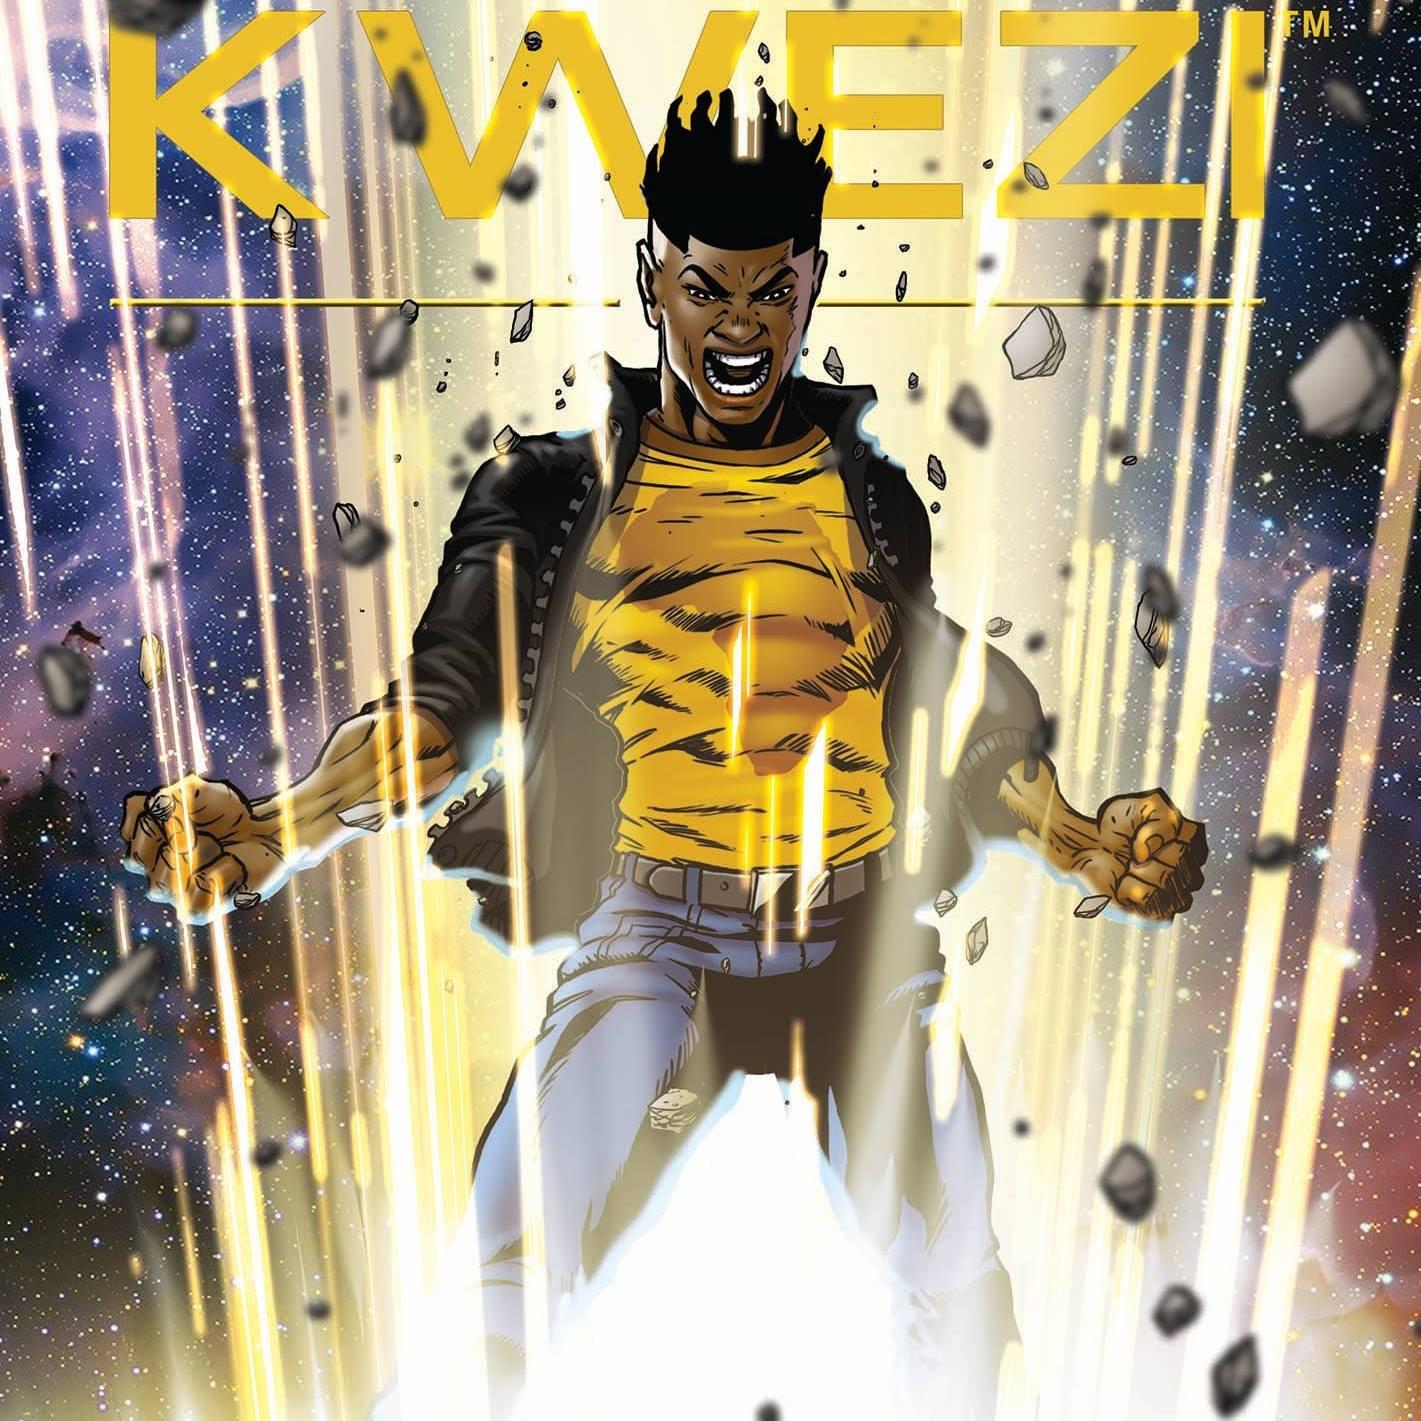 Kwezi comic featuring African warriors